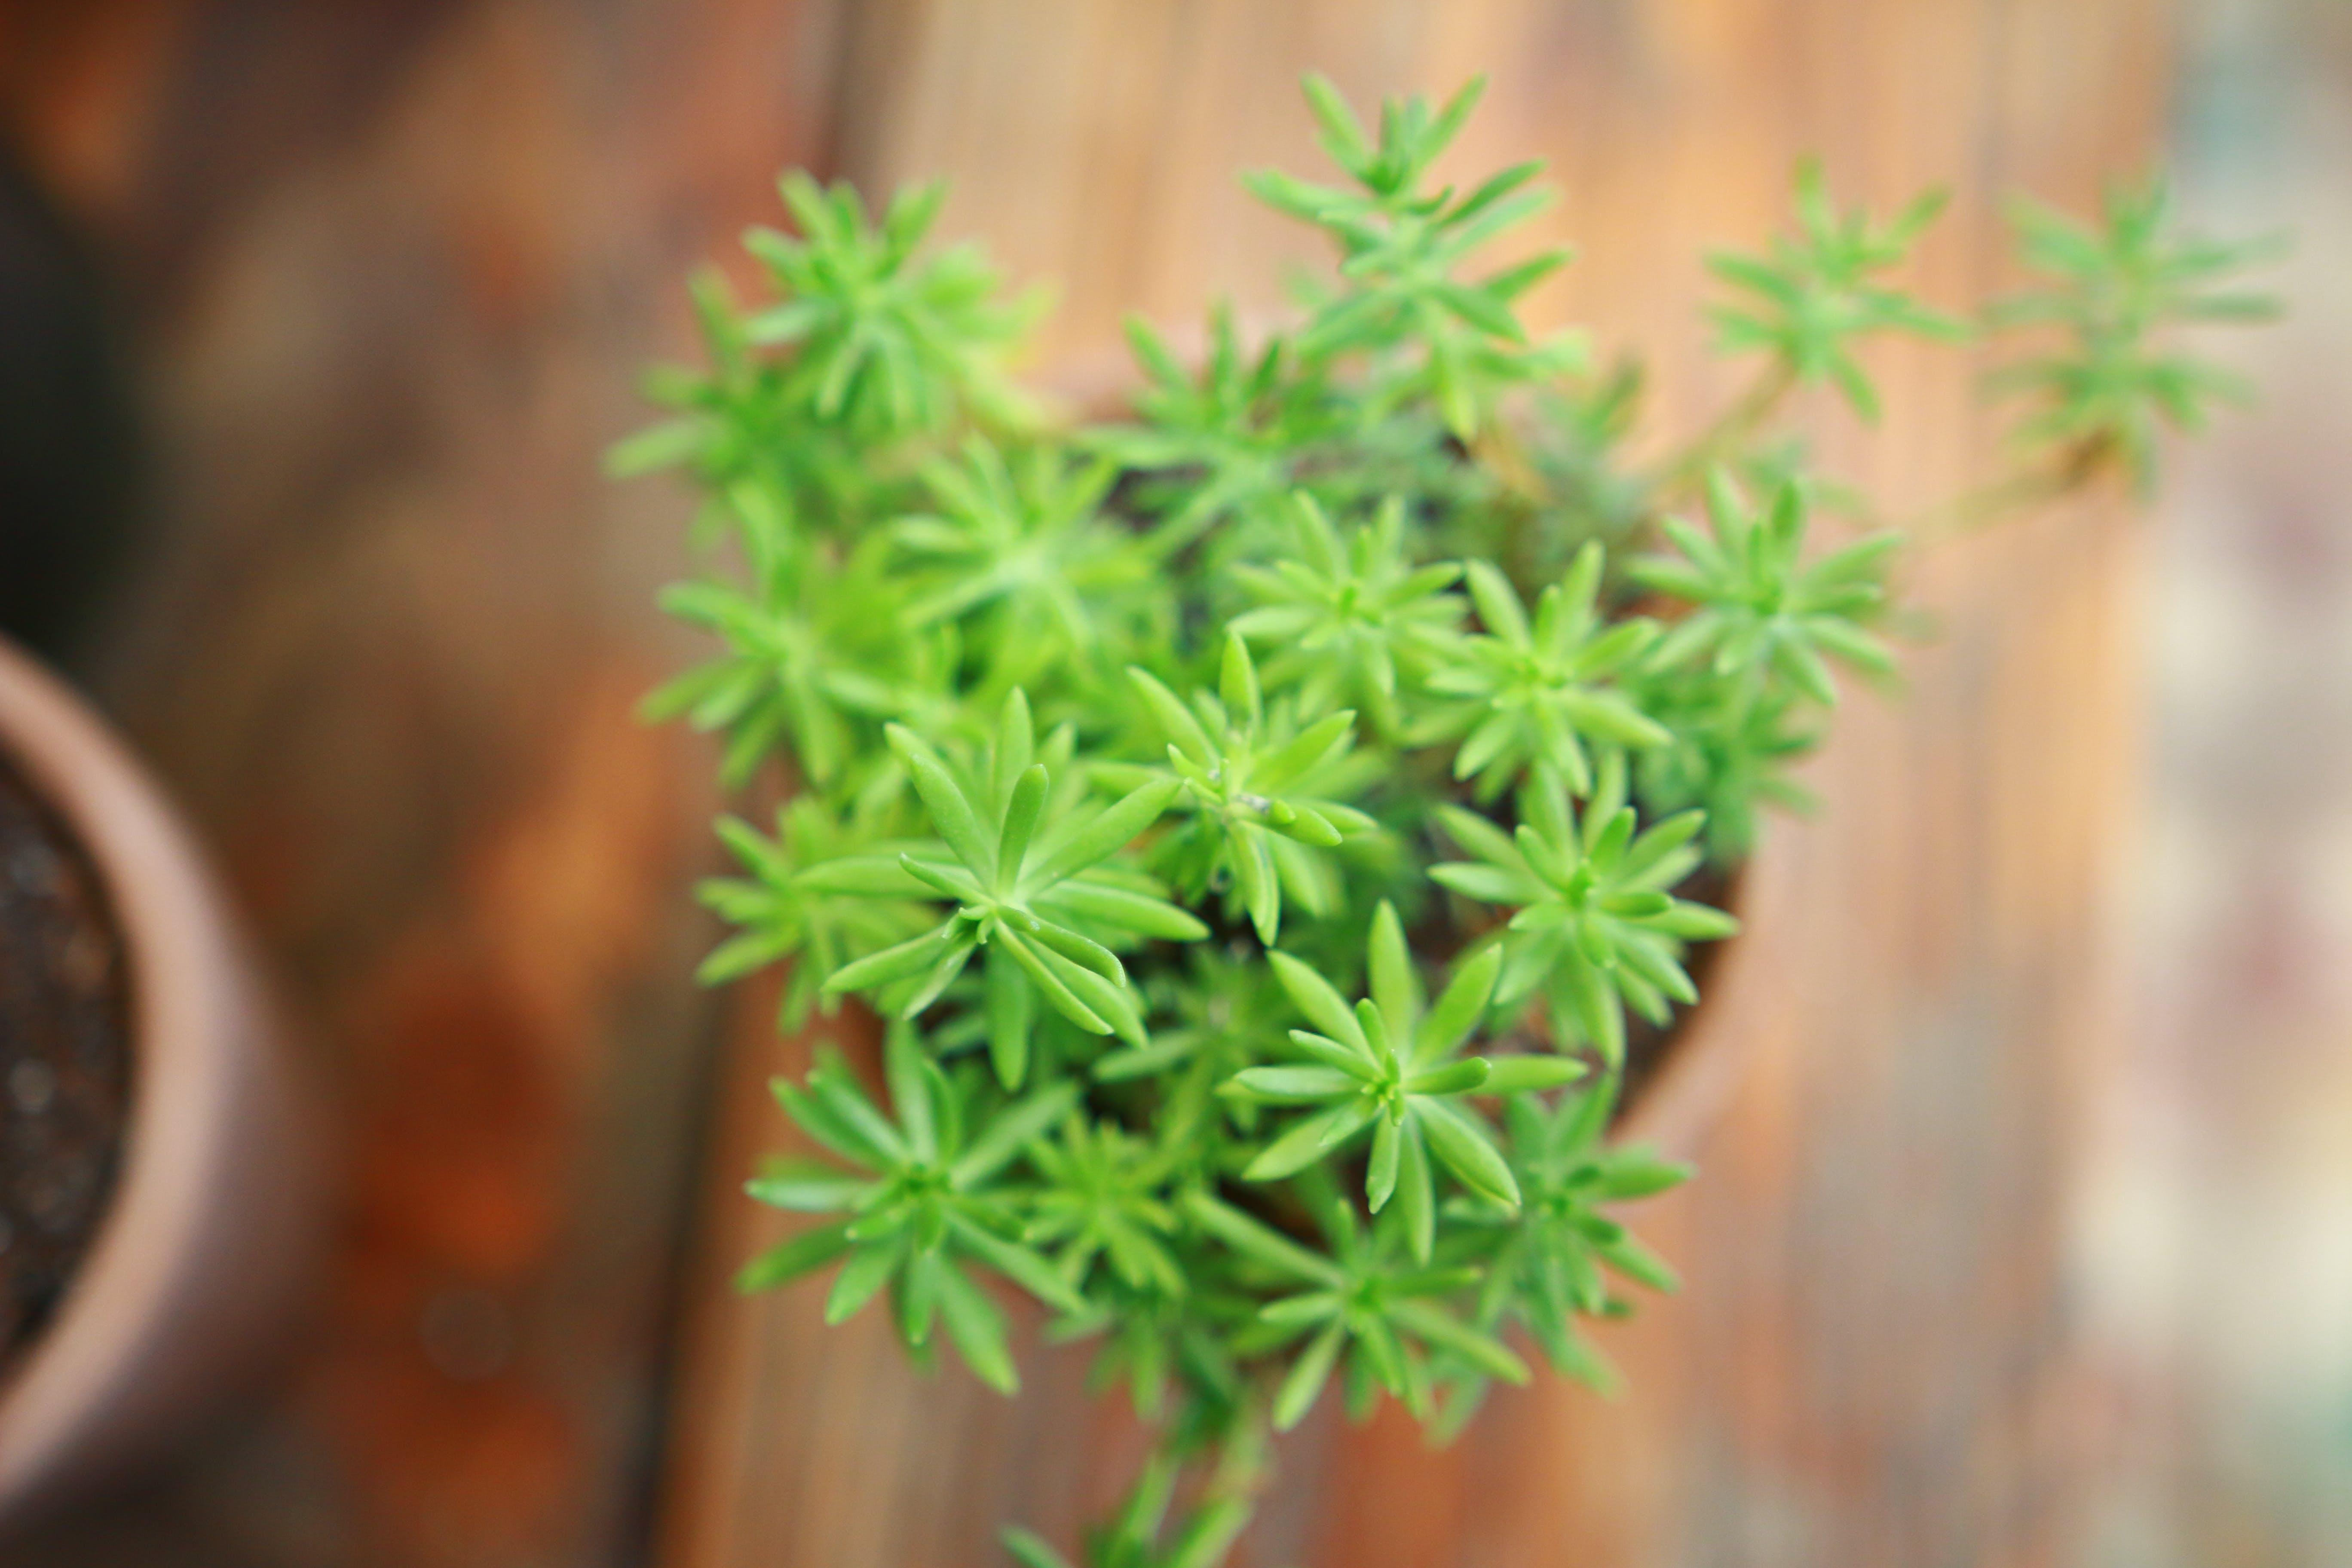 Kostenloses Stock Foto zu makro, nahansicht, pflanze, topf